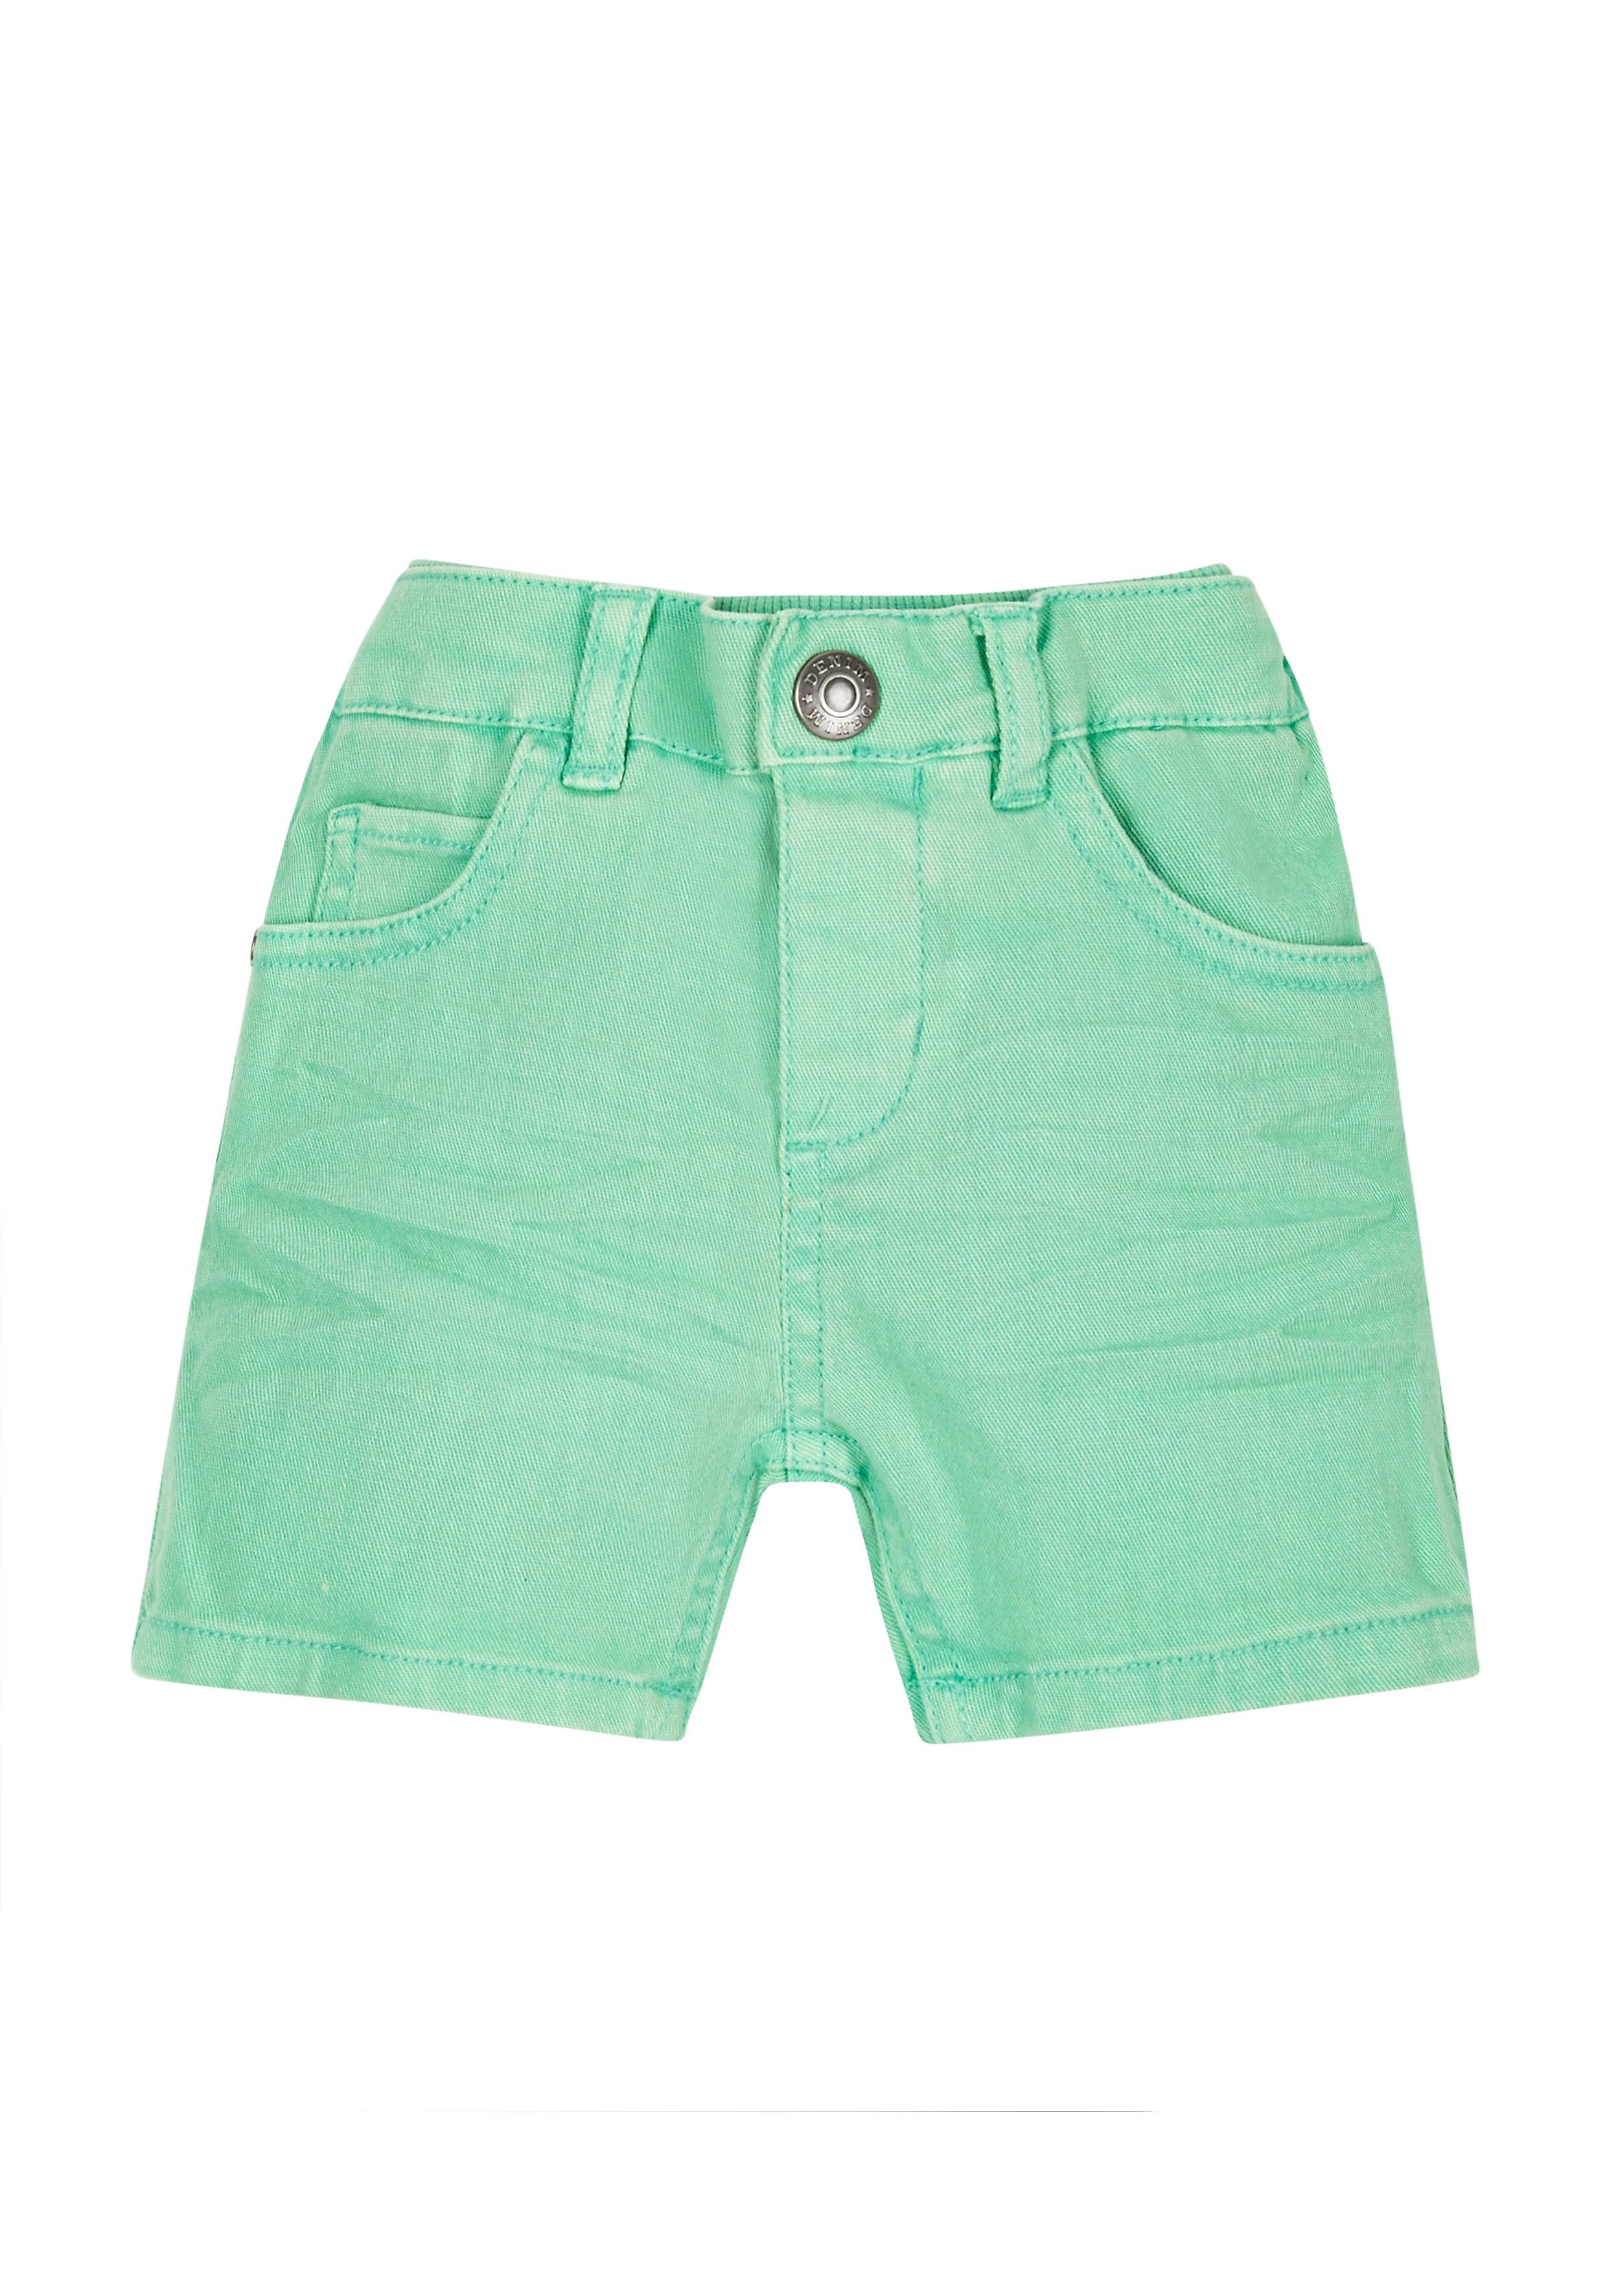 Mothercare | Boys Twill Shorts - Green